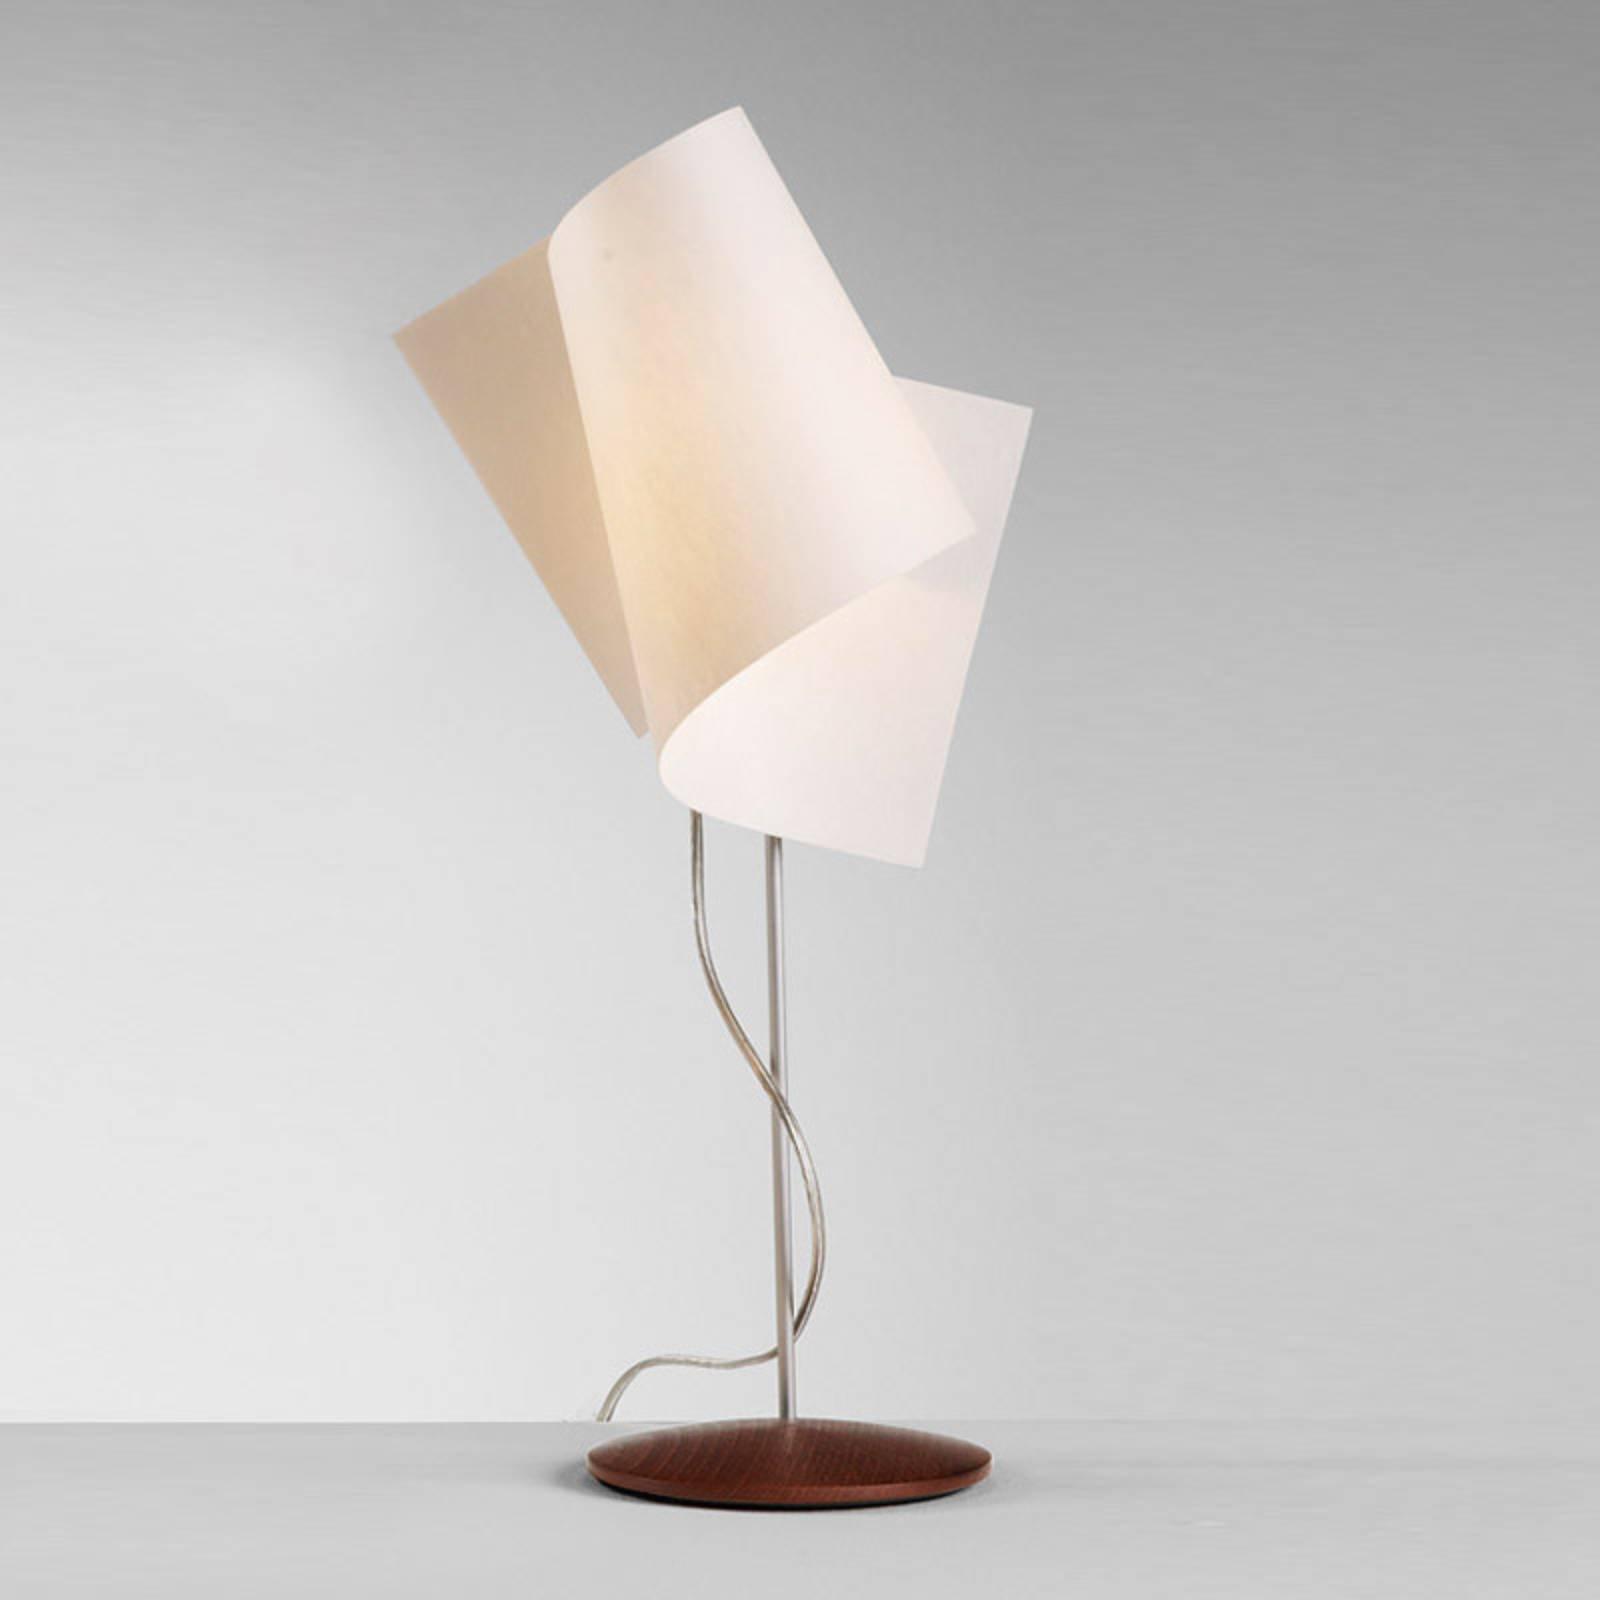 Interessant Loop bordlampe i nøttetre